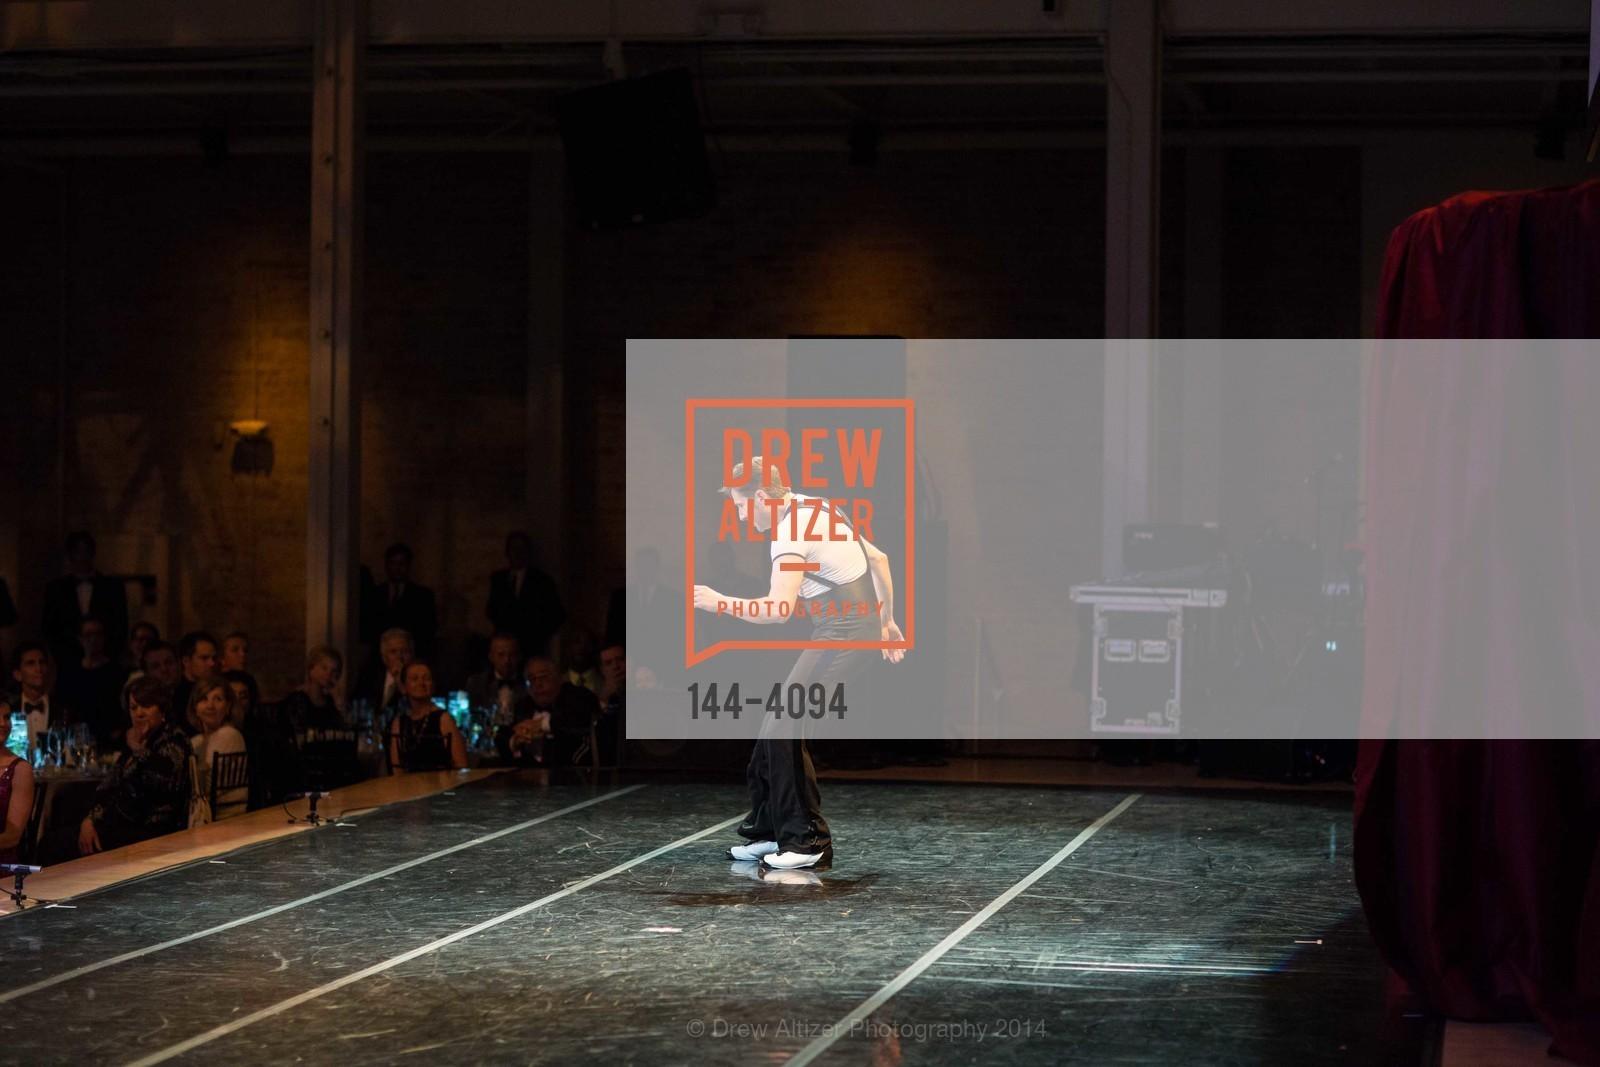 Performance, Photo #144-4094